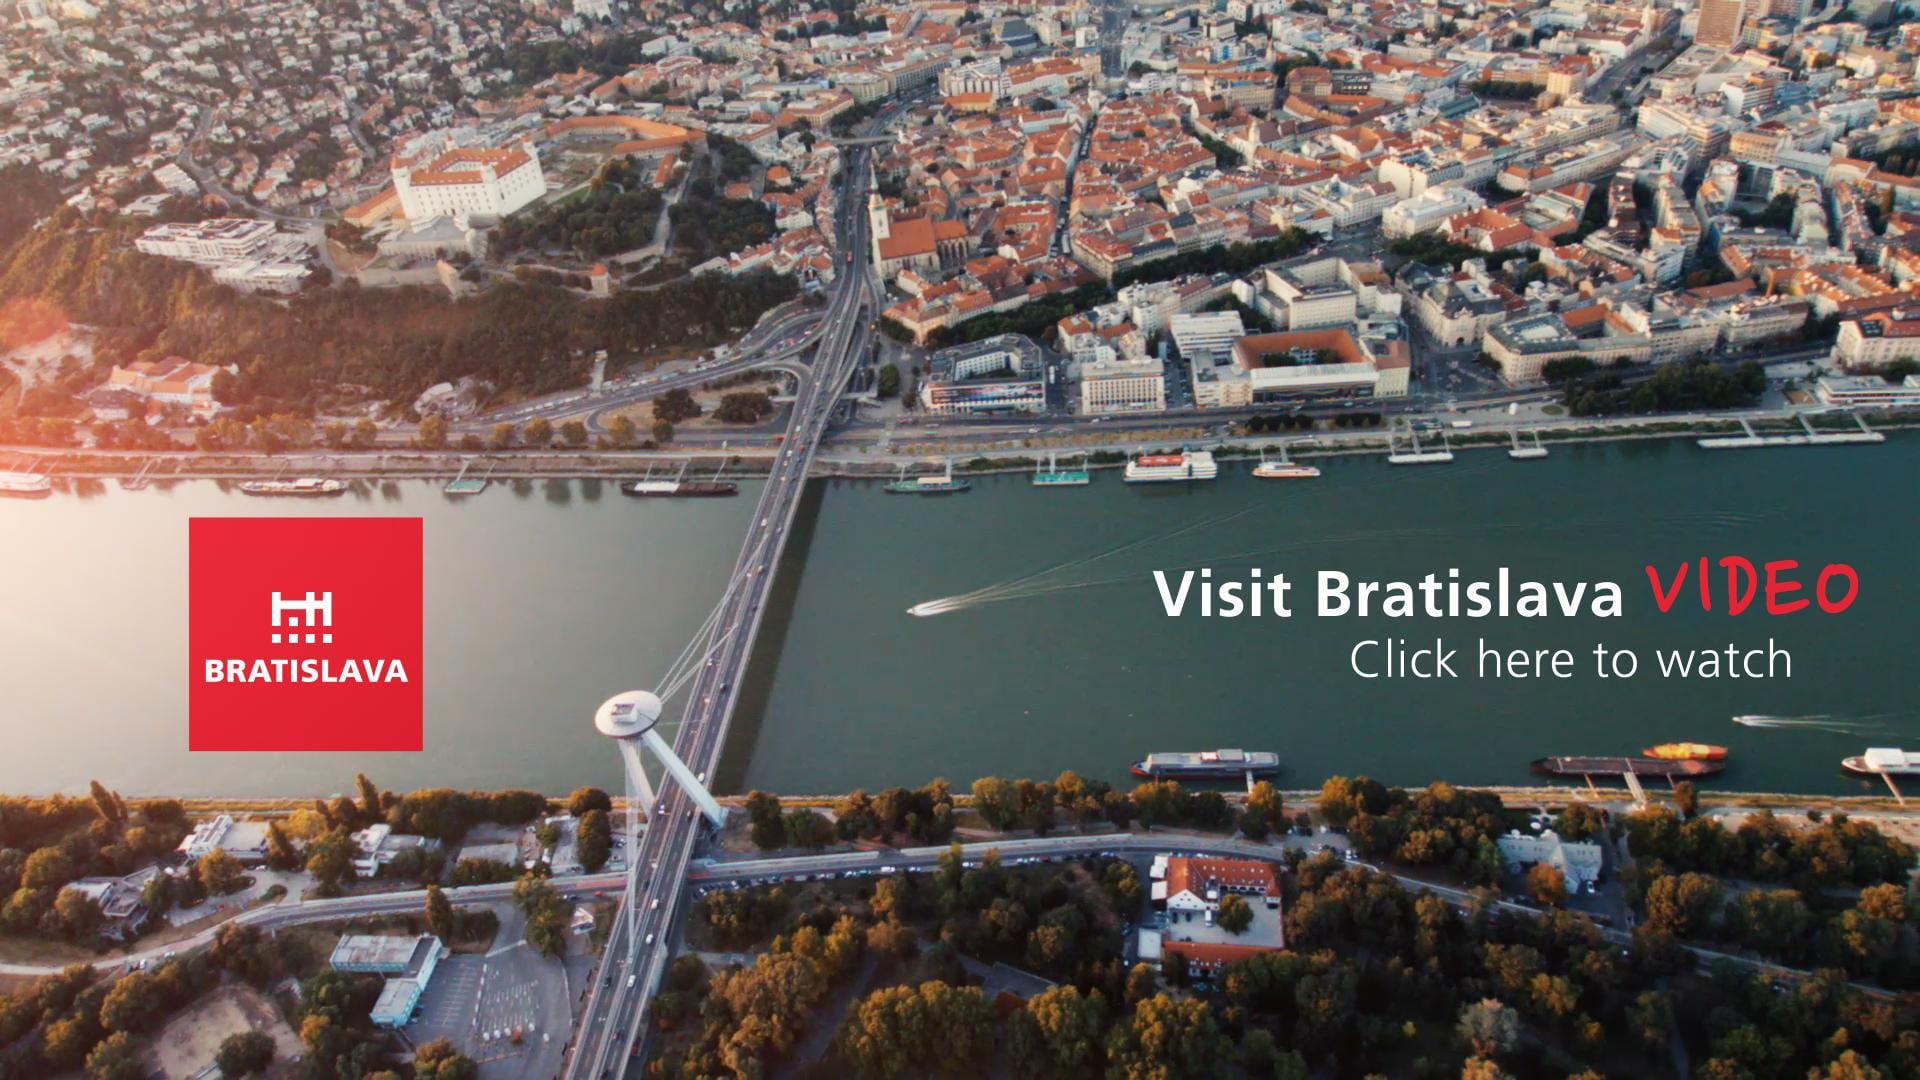 Visit Bratislava, Slovakia - Official video